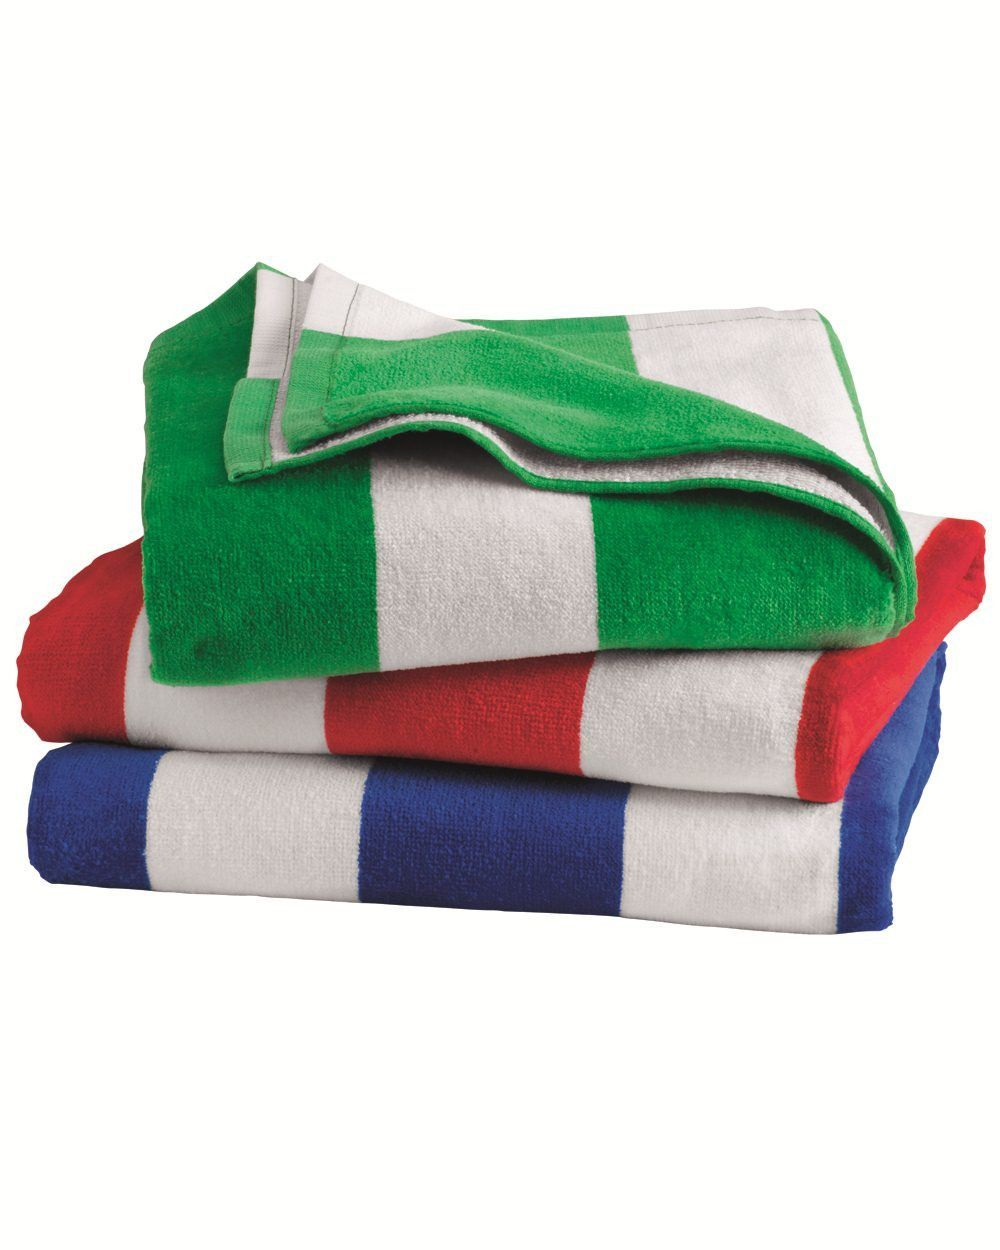 Carmel Towel Company Cabana Stripe Velour Beach Towel C3060s